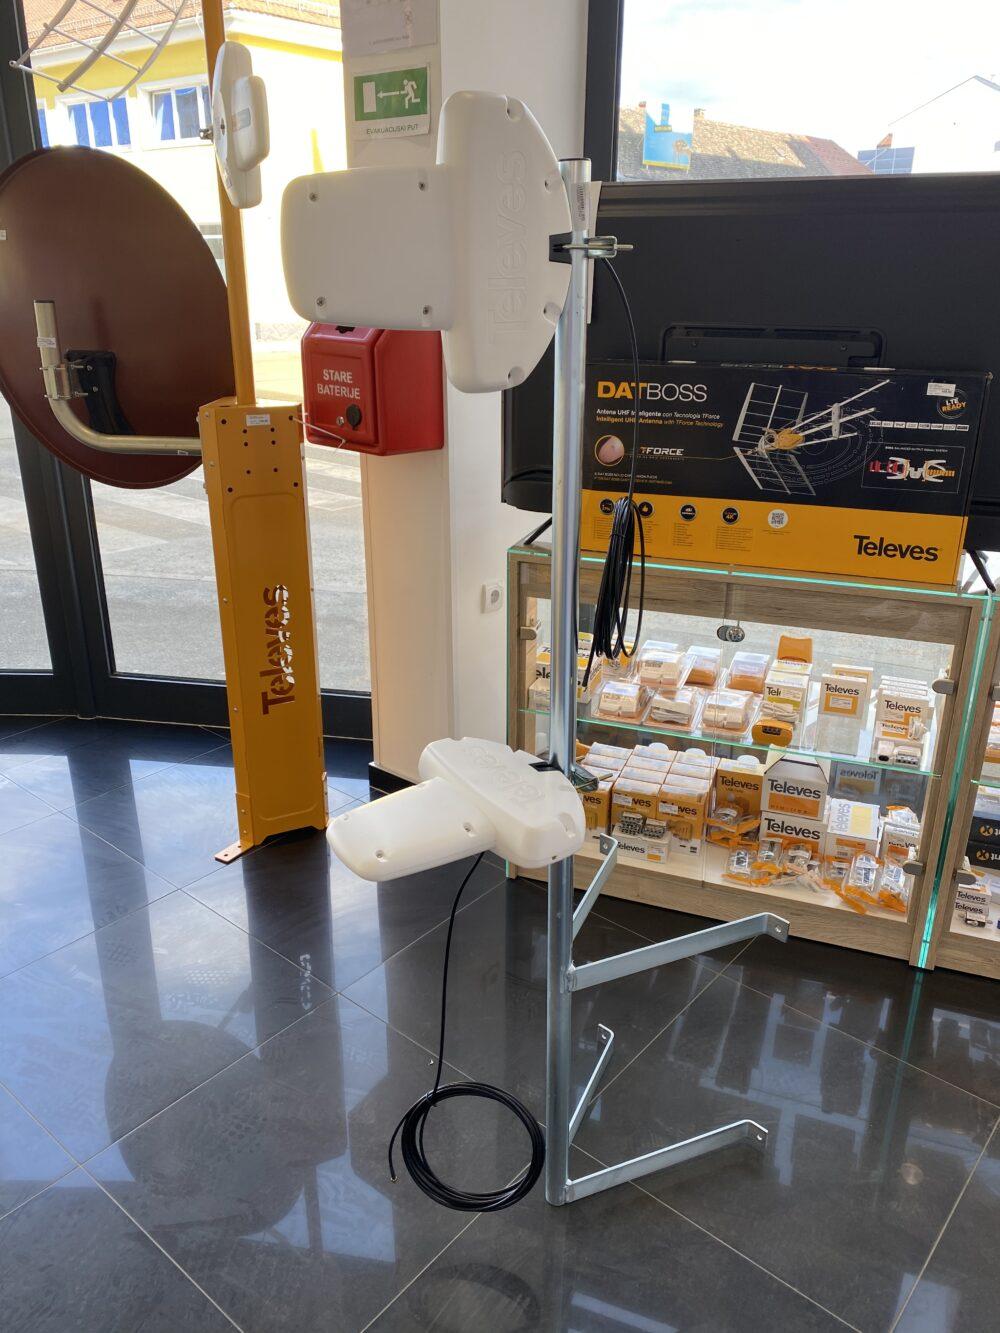 LTE_4G_NOVA_internet_antena_prodaja_Televes_hrvatska_Tehnoalarm